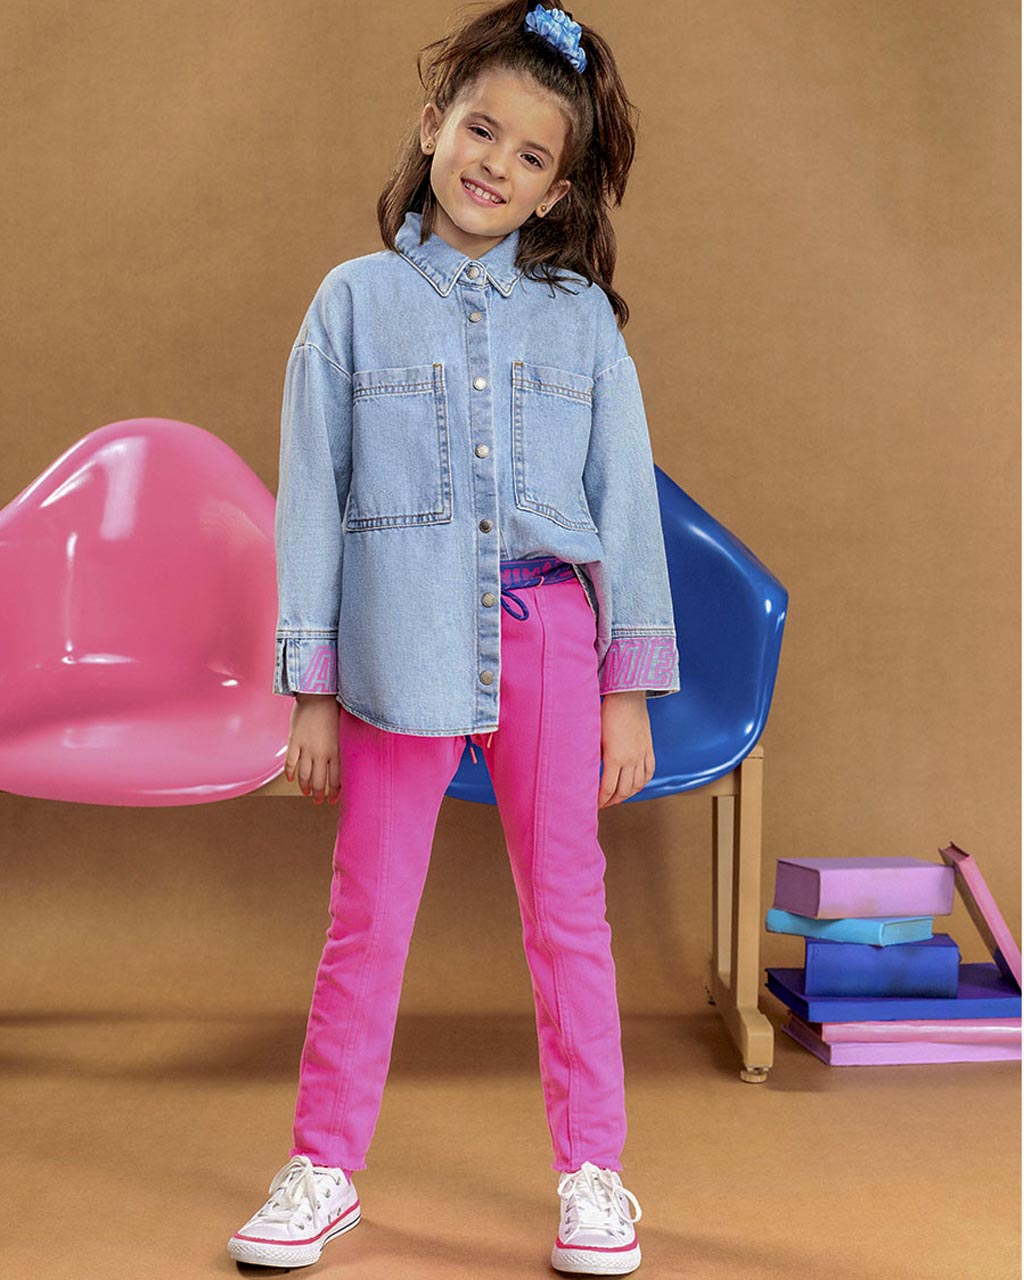 Camisete Infantil Jeans Arte Rosa nos Punhos Animê